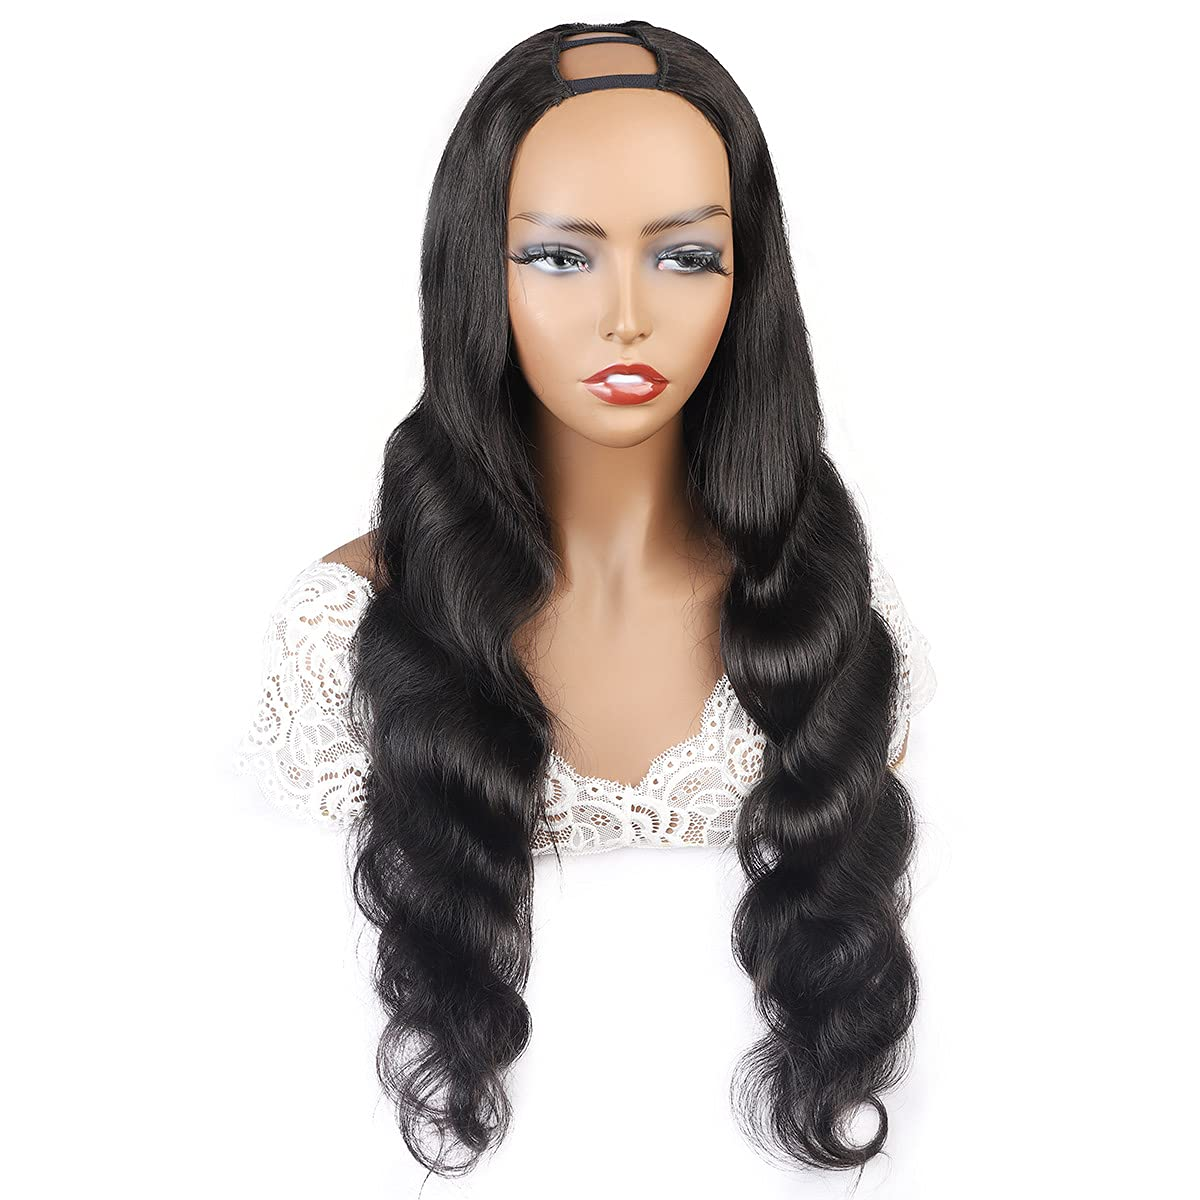 Black silky straight U New Free Shipping part wig sty remy human Albuquerque Mall hair fashion star